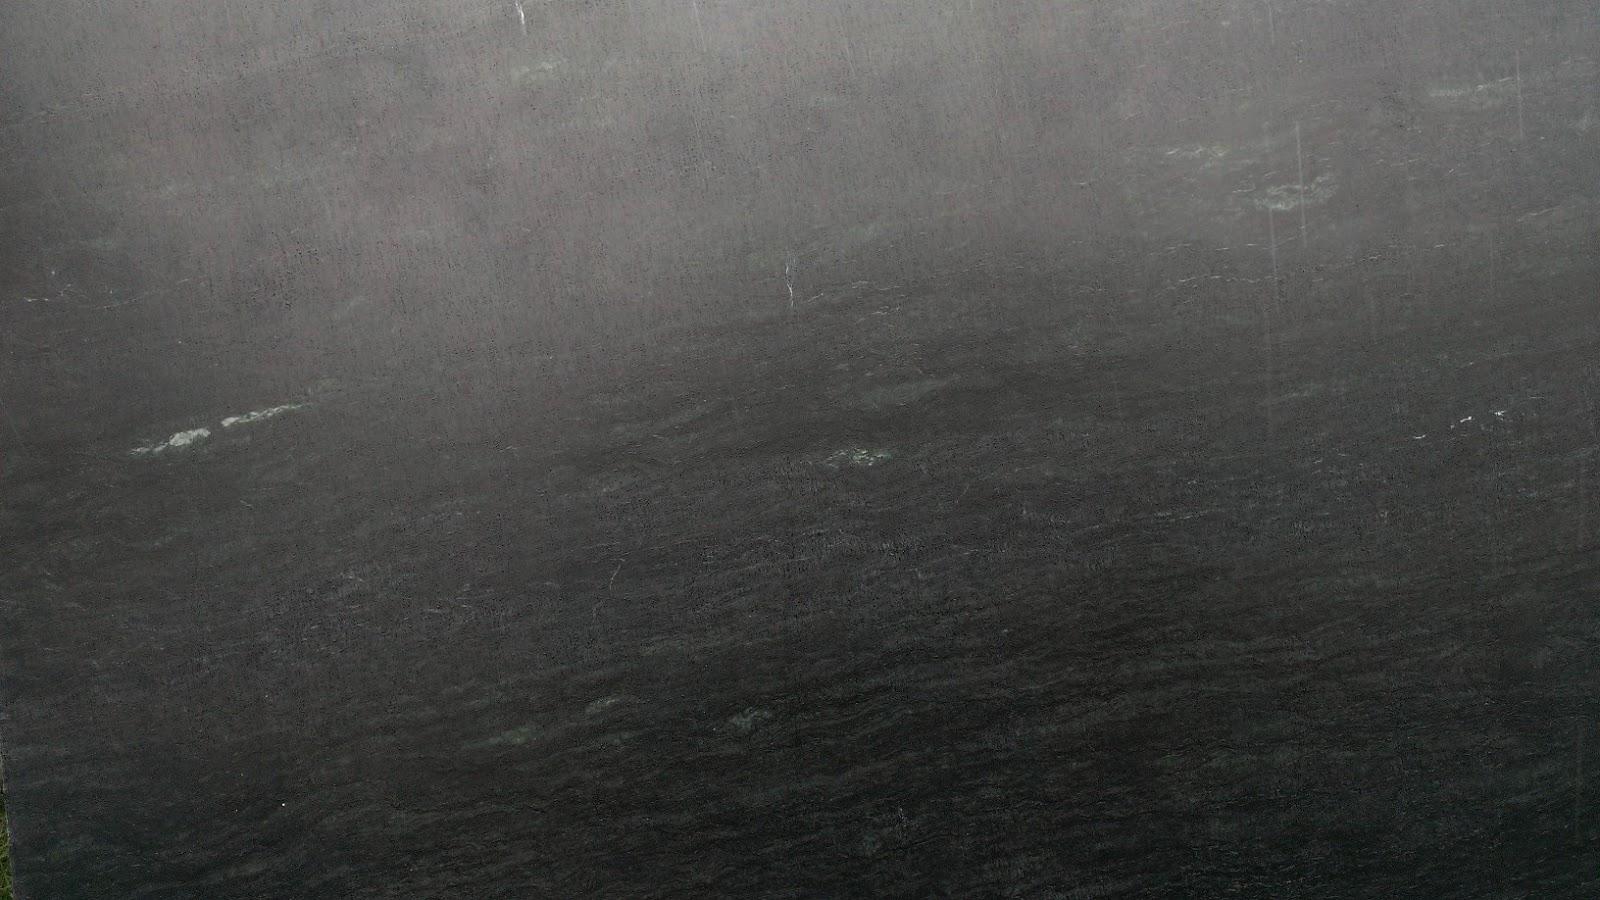 HONED DARK JULIA (SABON) SOAPSTONE | CROCODILE ROCKS